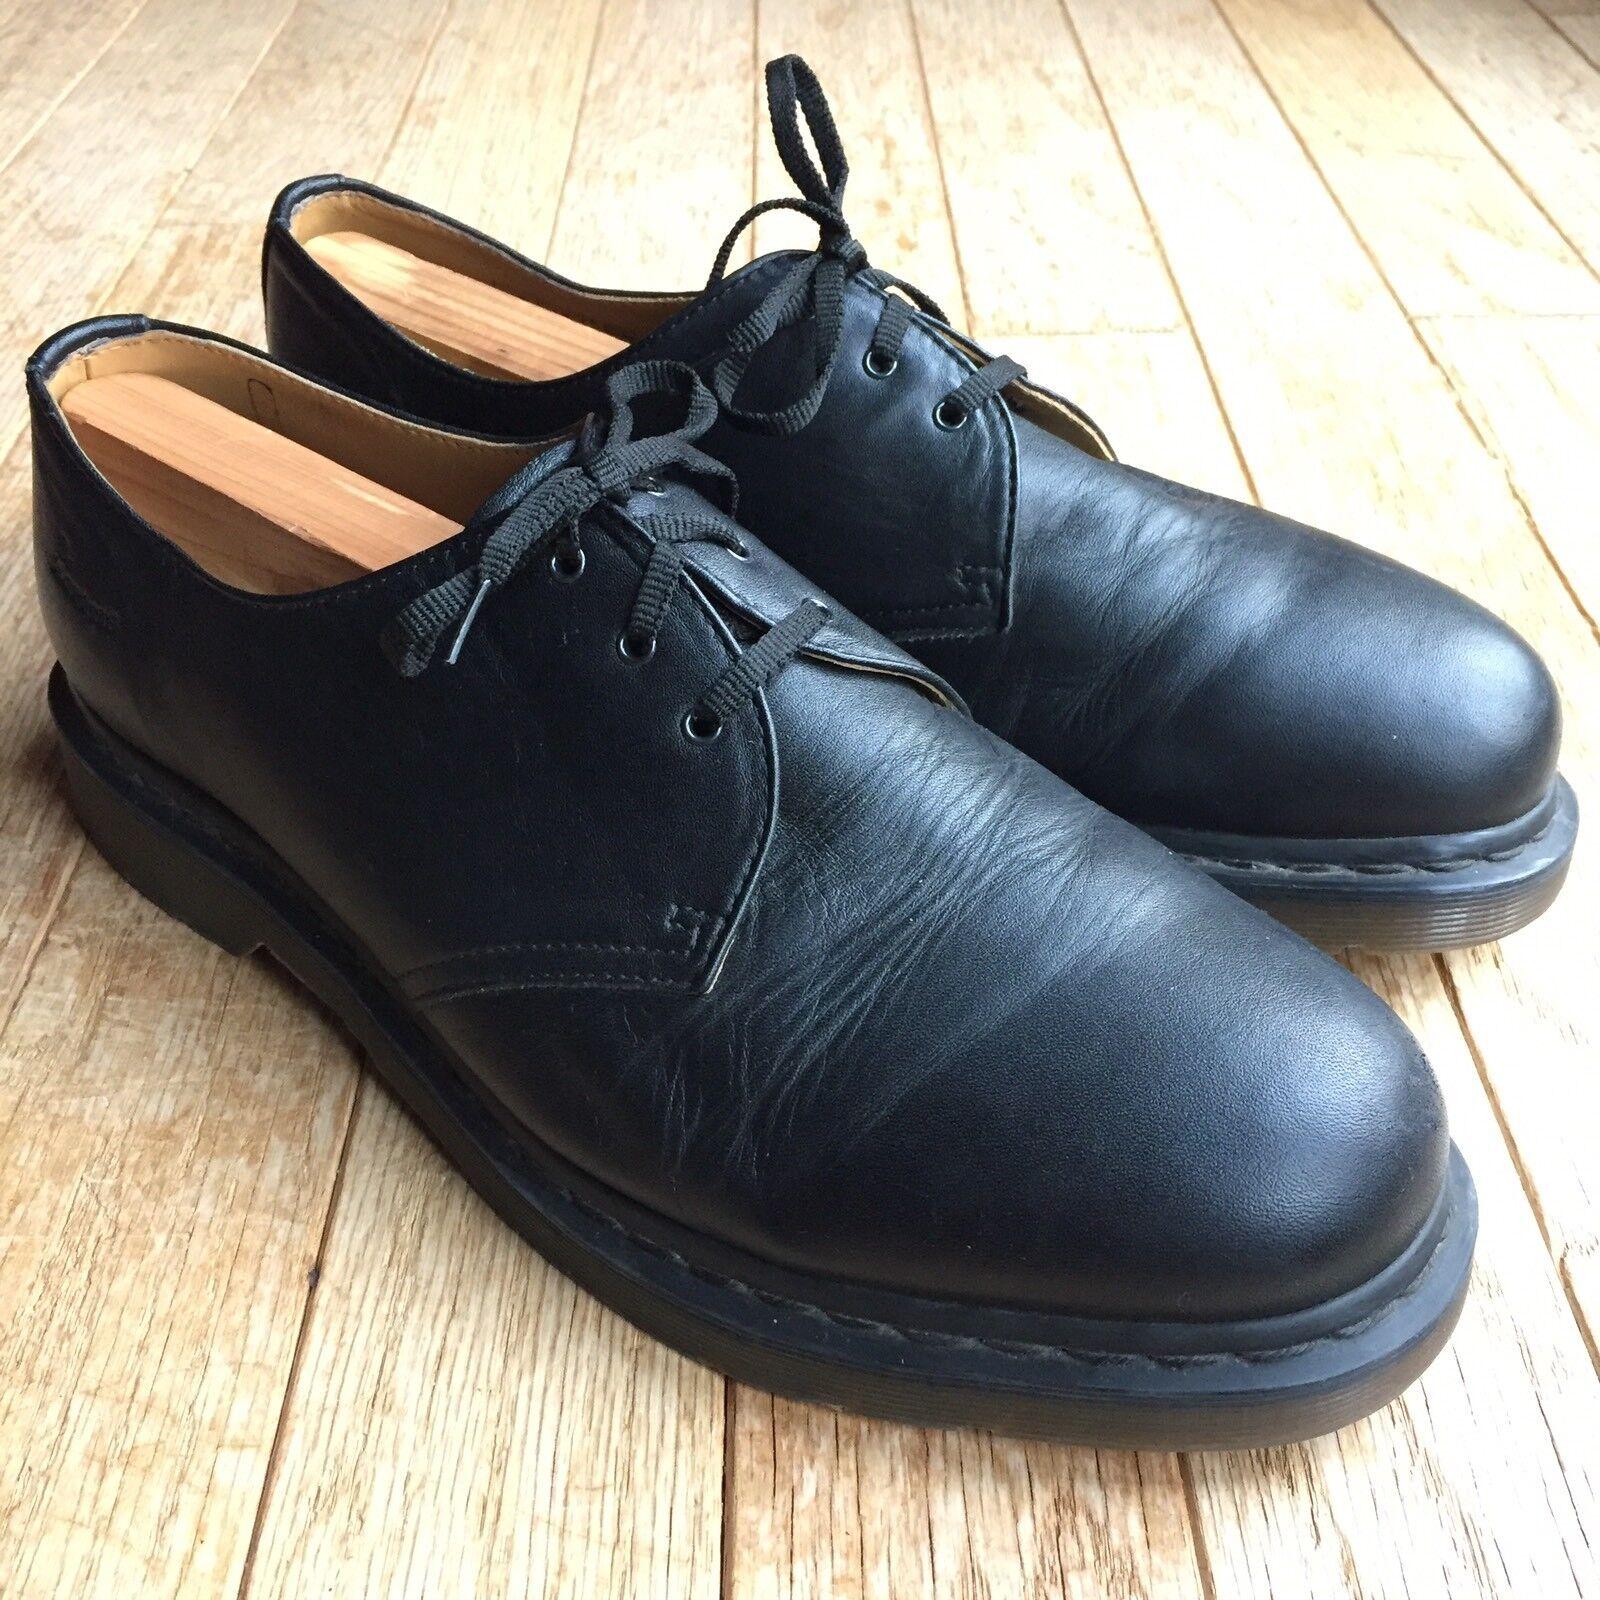 DR. MARTENS 11838 Mens Black Leather Classic Oxfords shoes Size UK 12 US 13